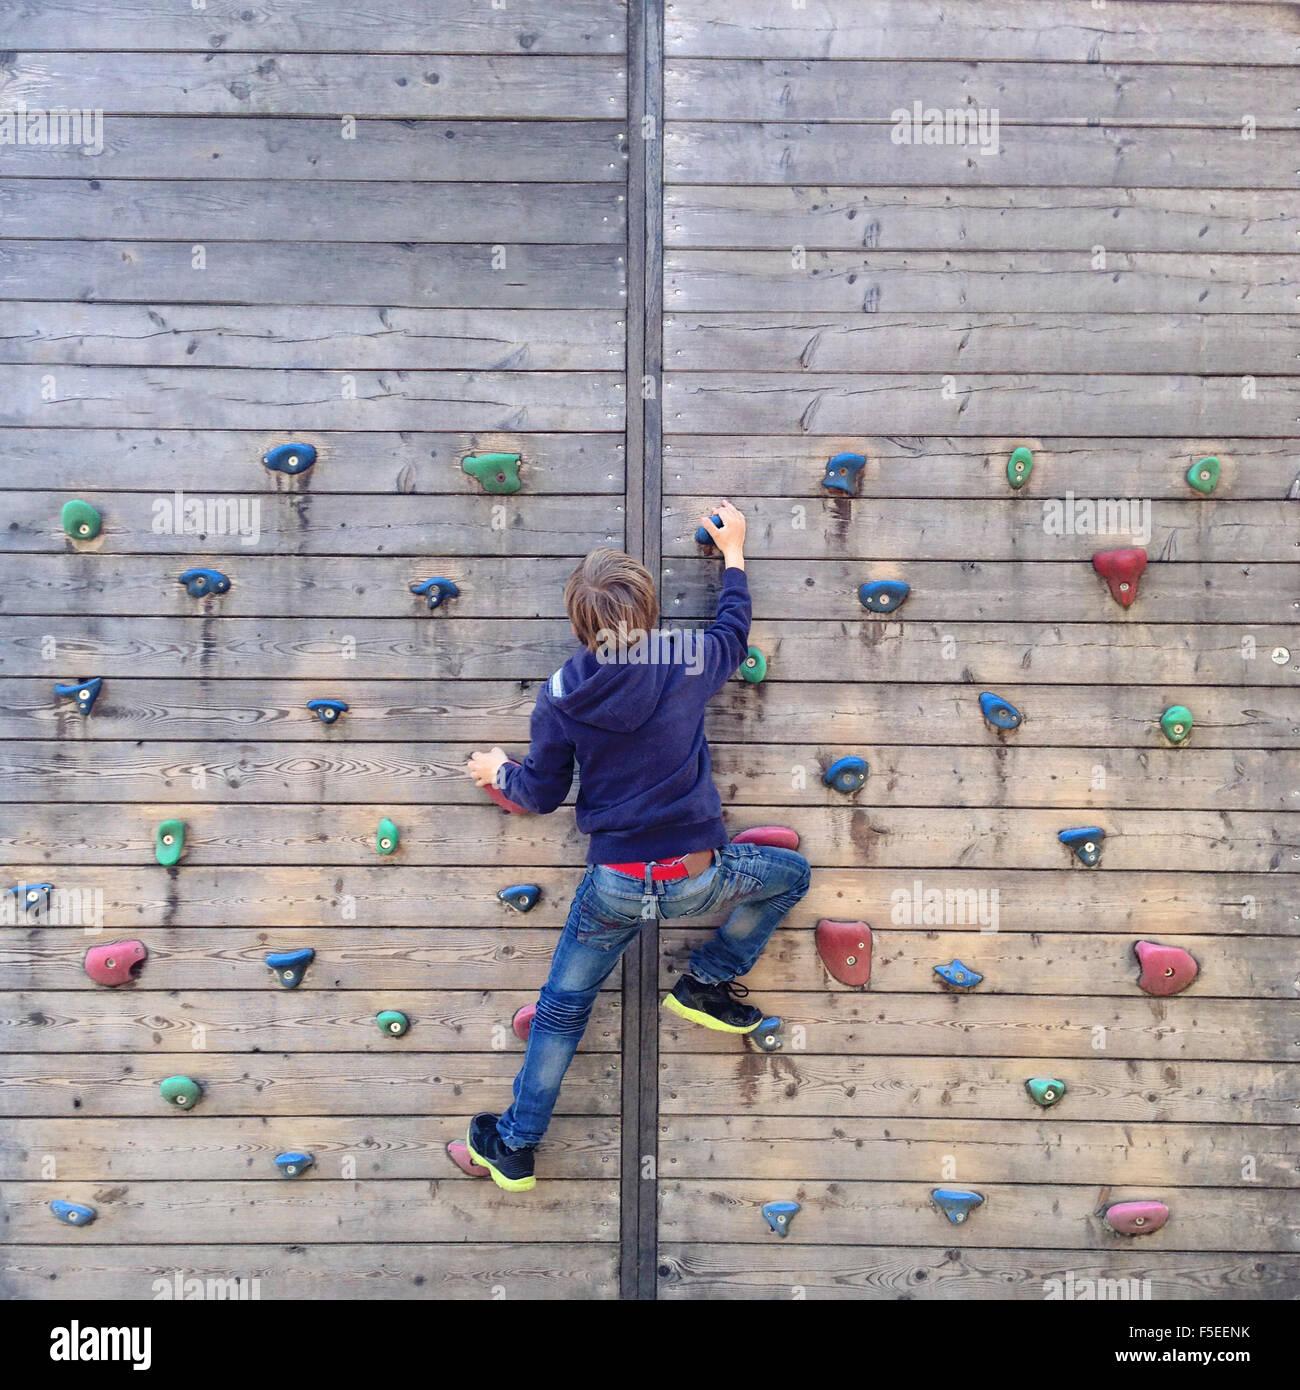 Boy climbing on Climbing Wall Photo Stock